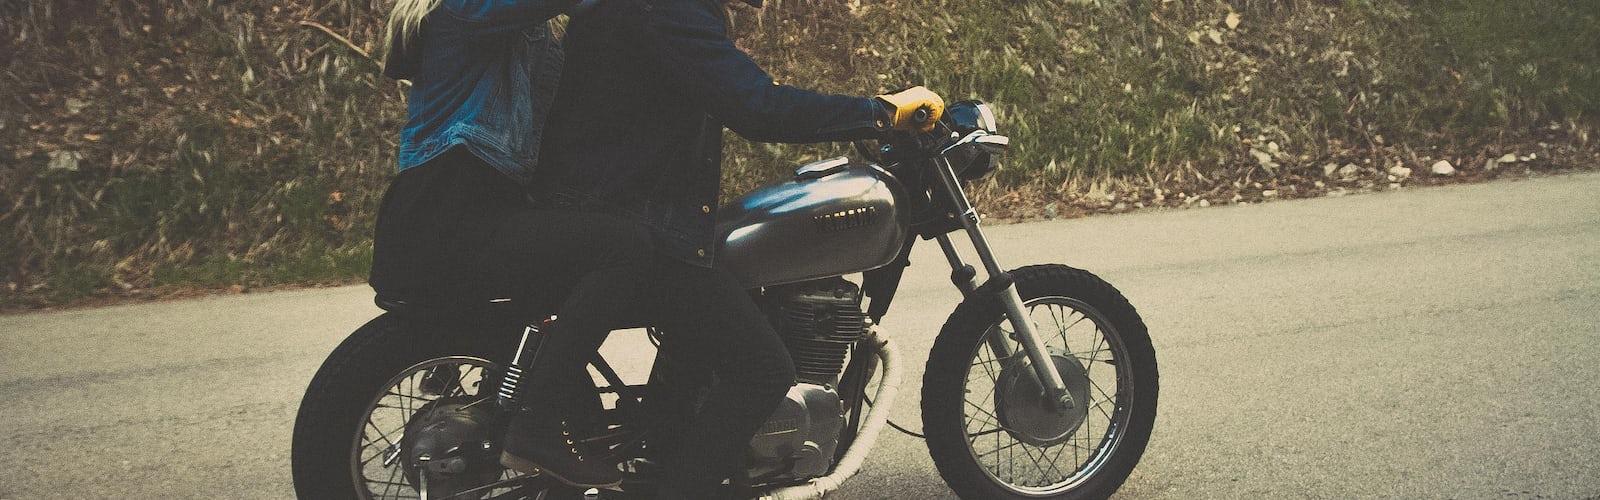 Cafe Racer 22 Best Free Cafe Racer Motorcycle Motorbike